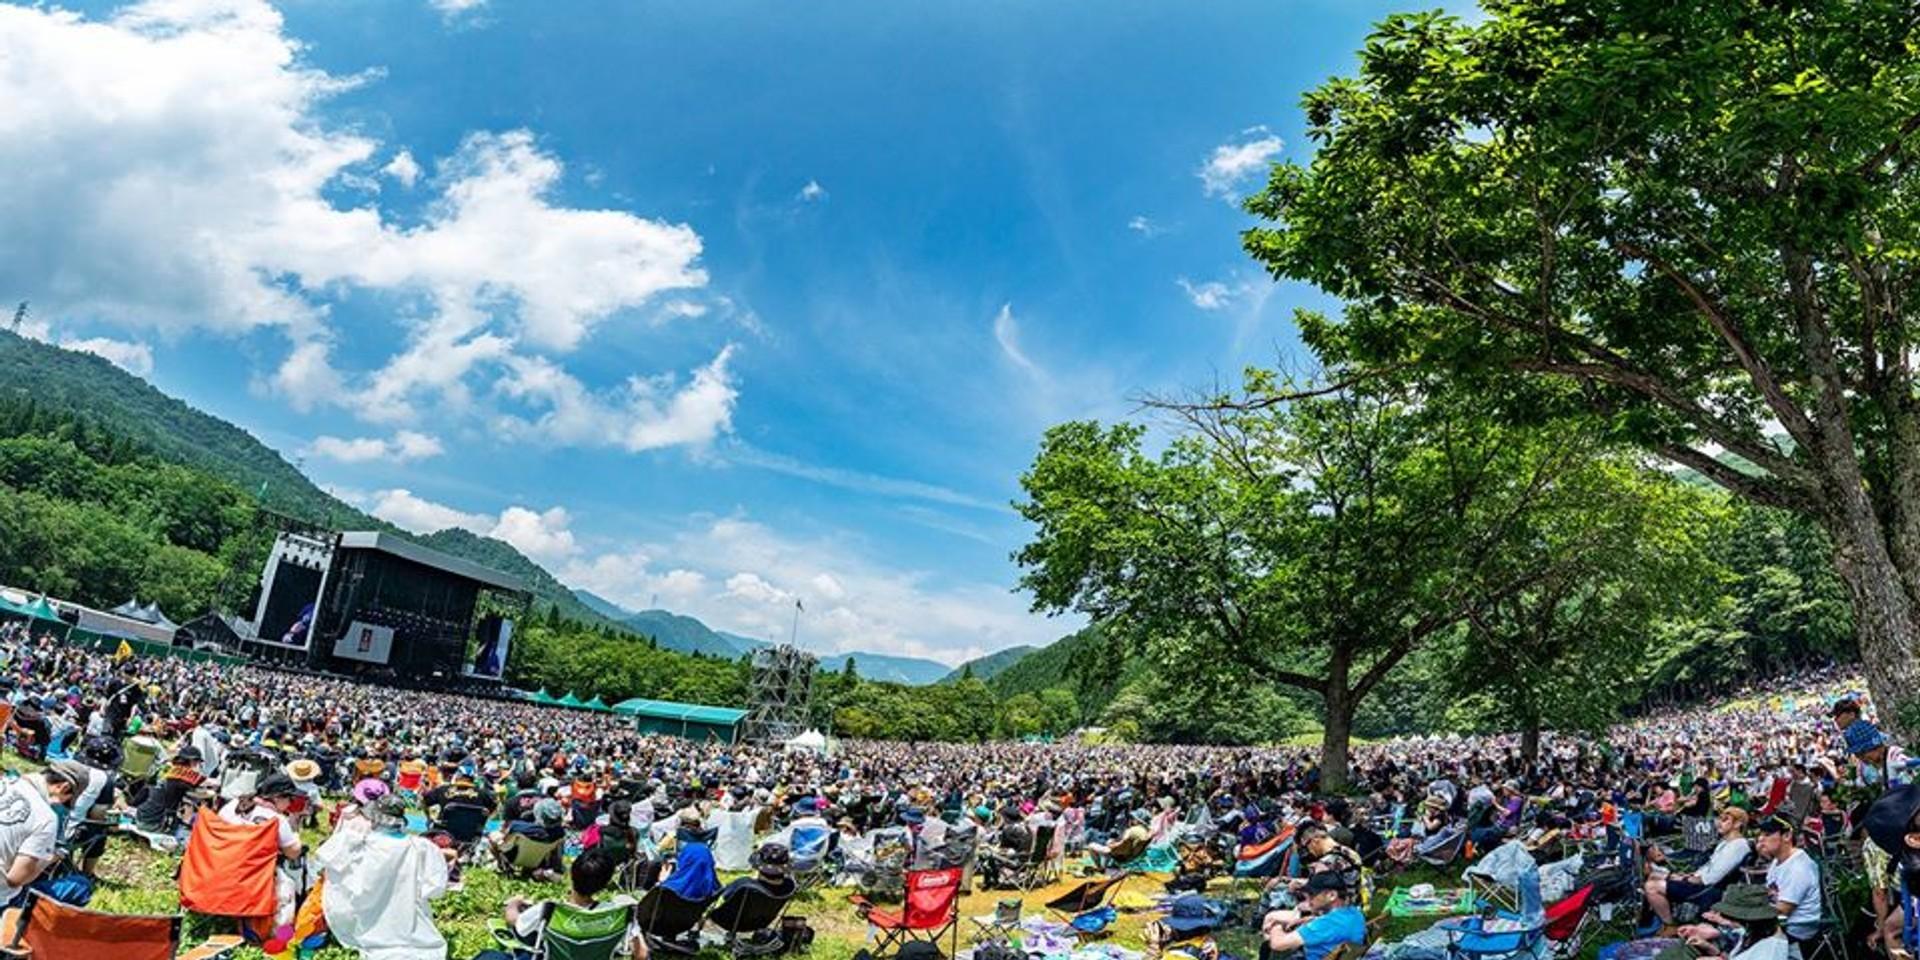 Japan's Fuji Rock Festival 2020 cancelled, confirm 2021 dates